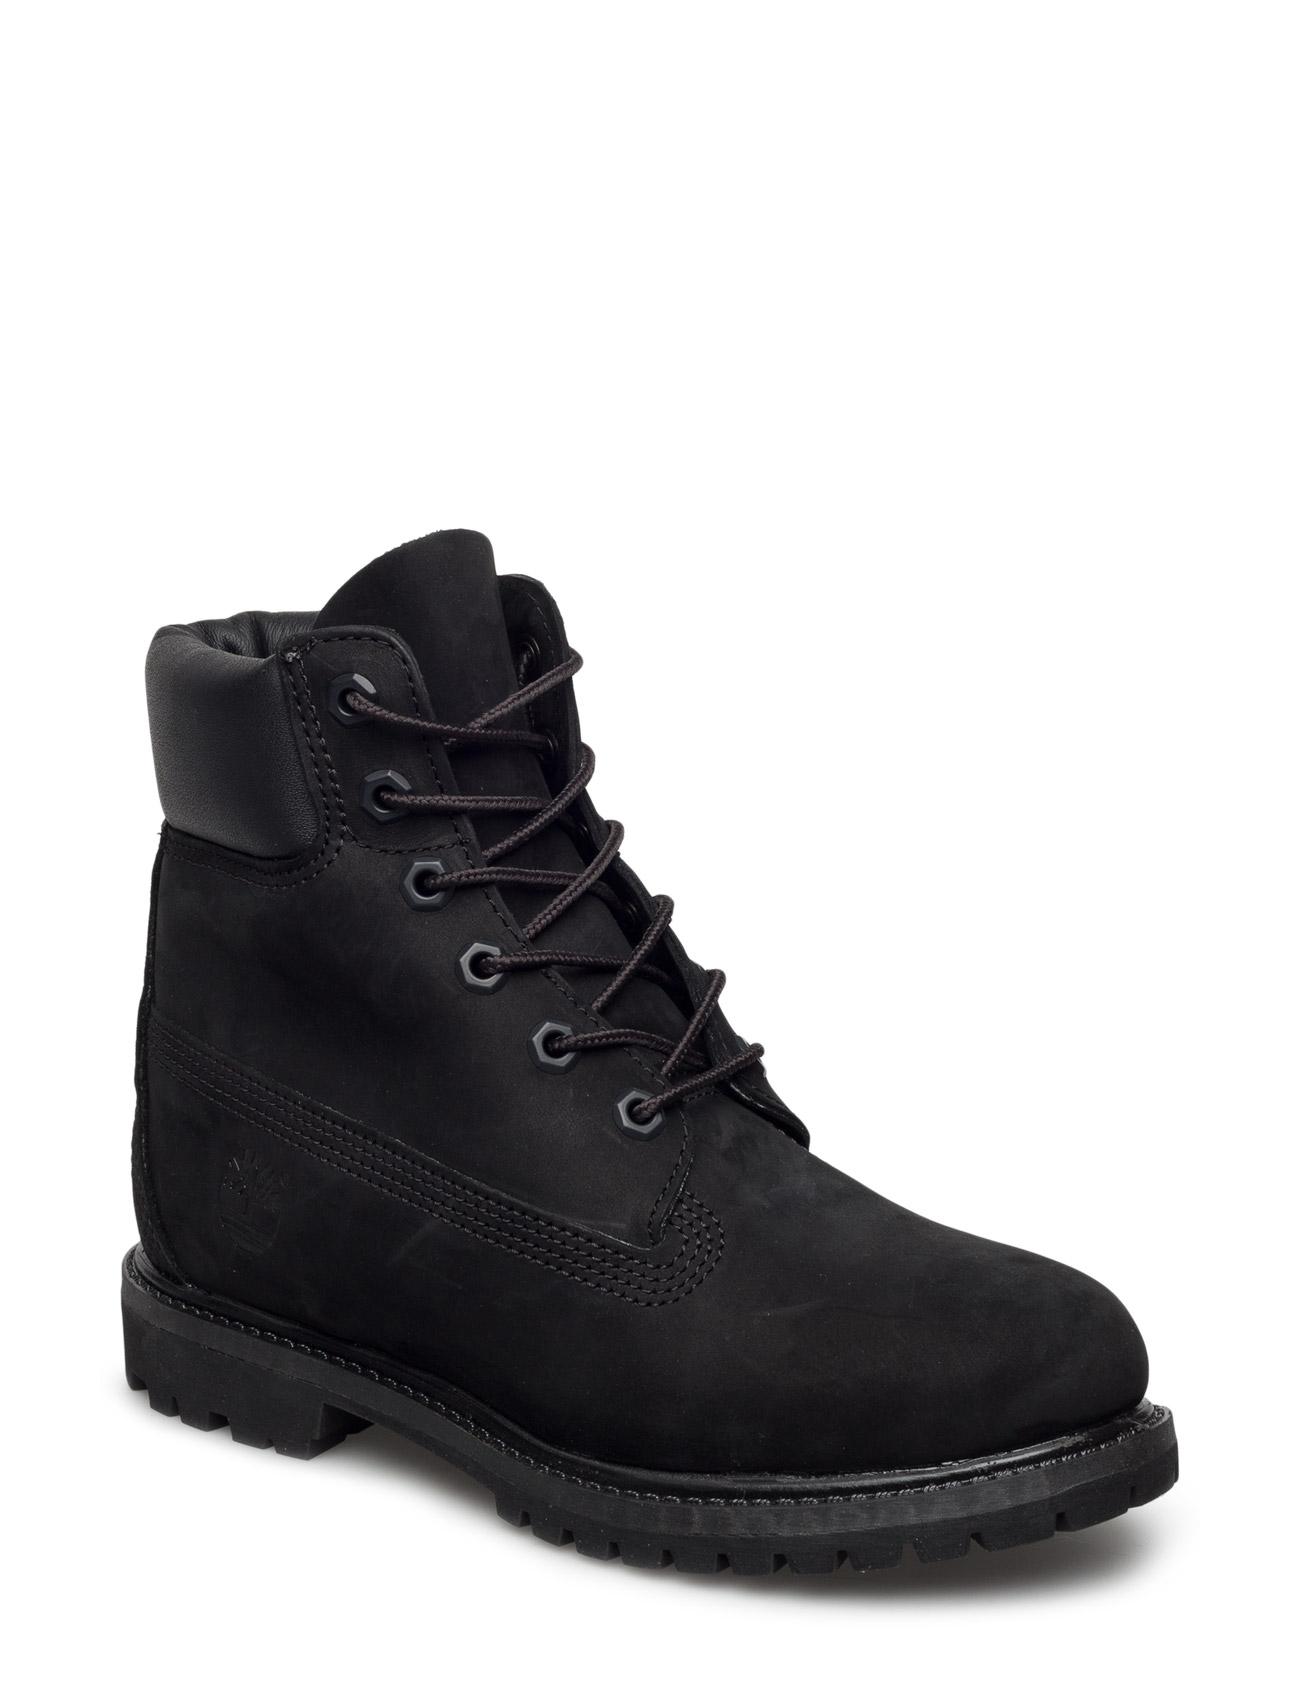 Timberland 6in Premium Boot - W